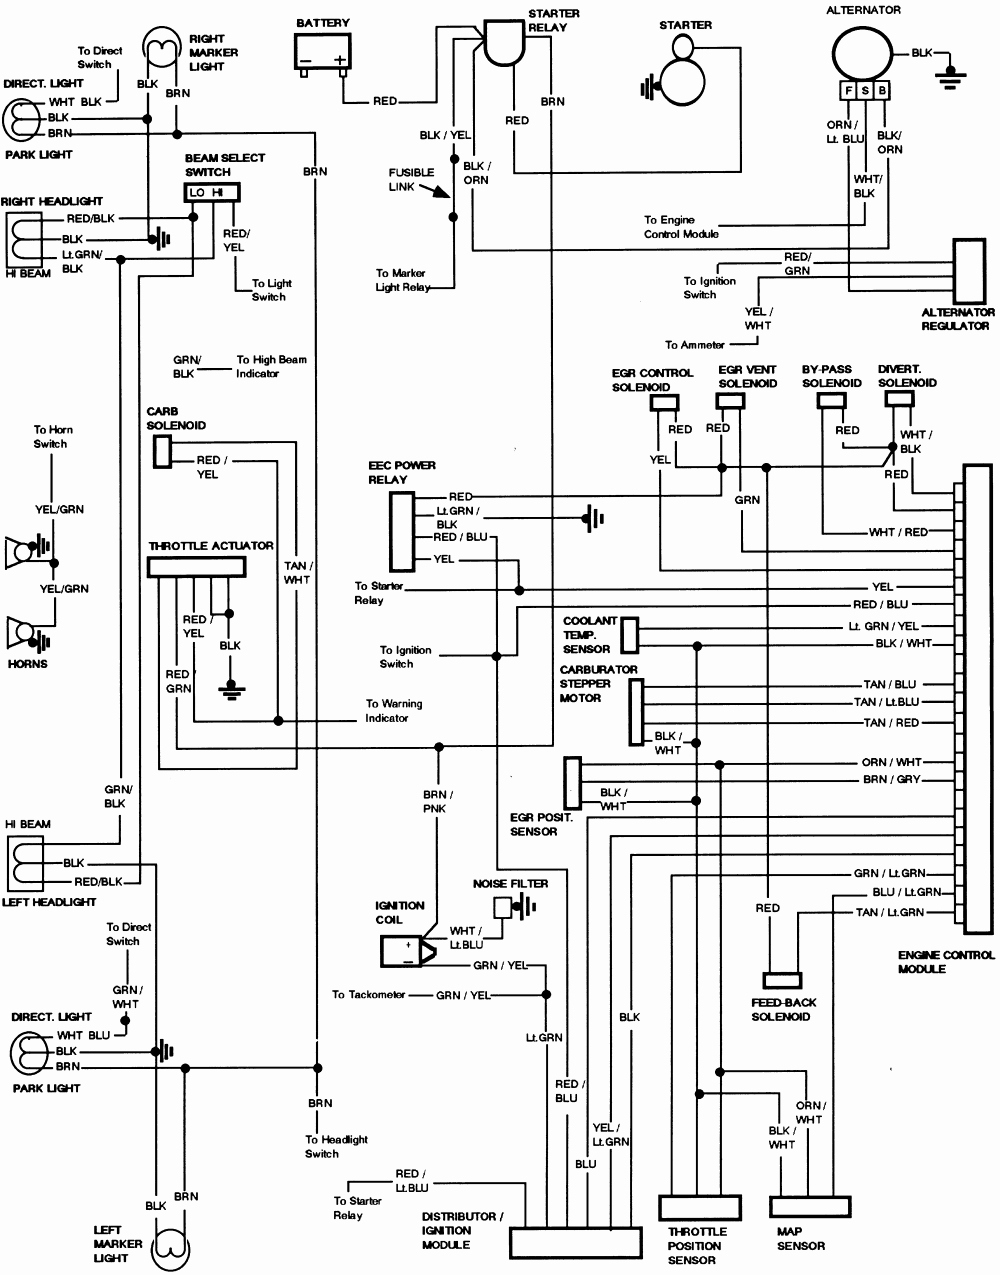 2007 ford ranger electrical wiring diagram